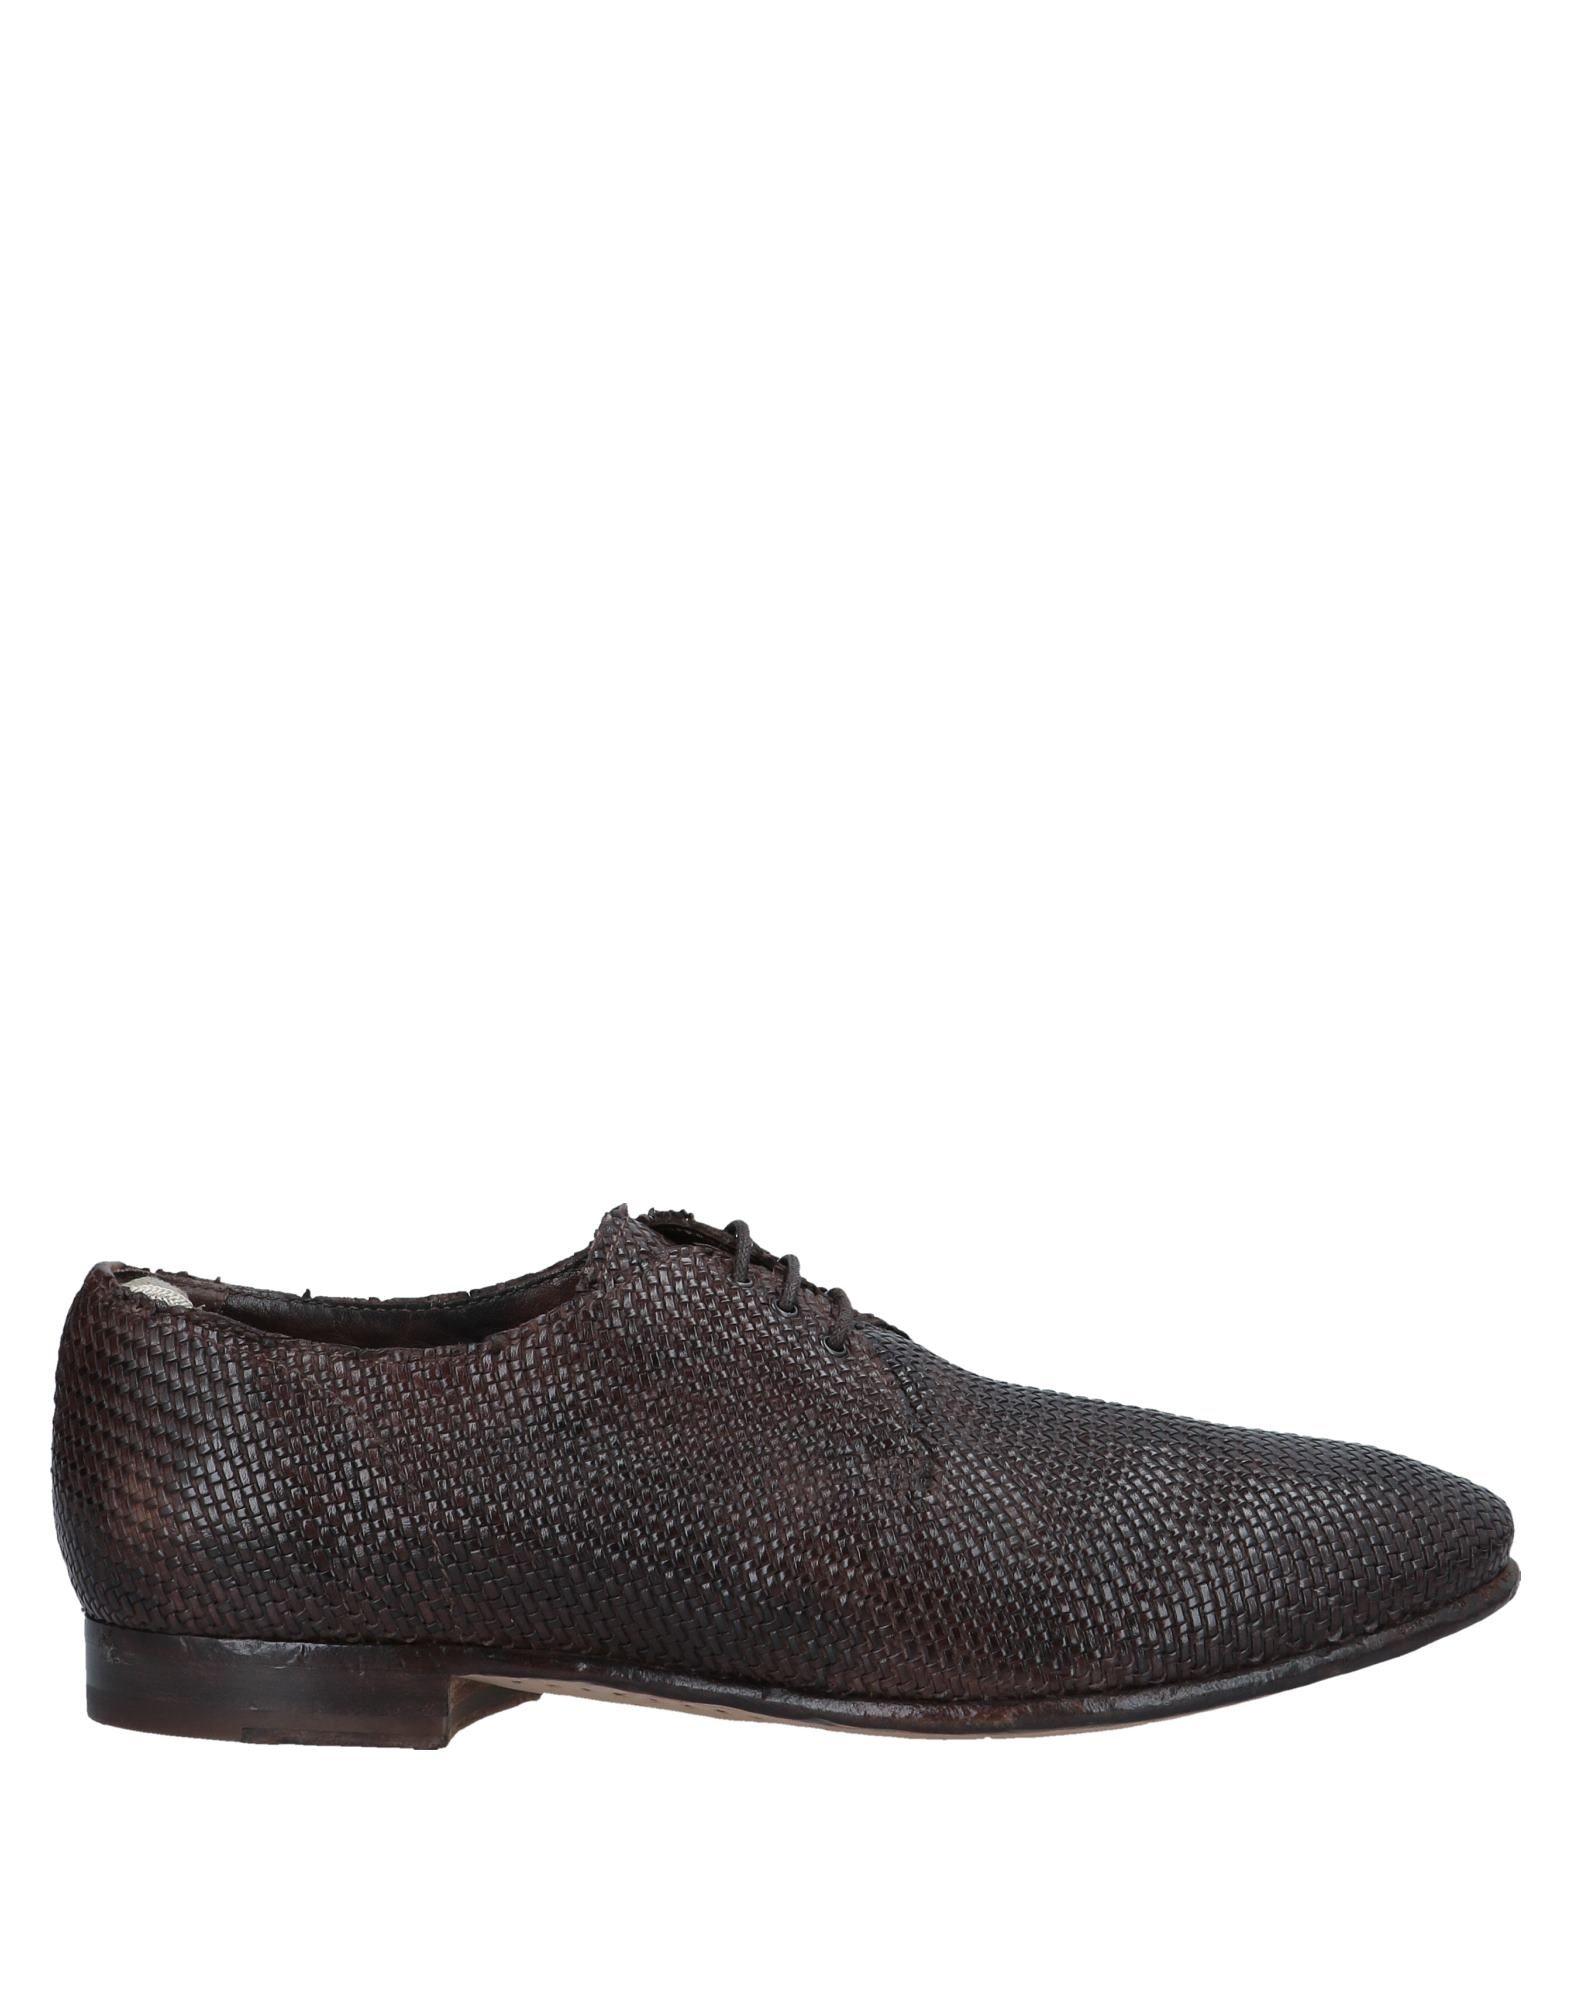 OFFICINE CREATIVE ITALIA Обувь на шнурках griff italia обувь на шнурках